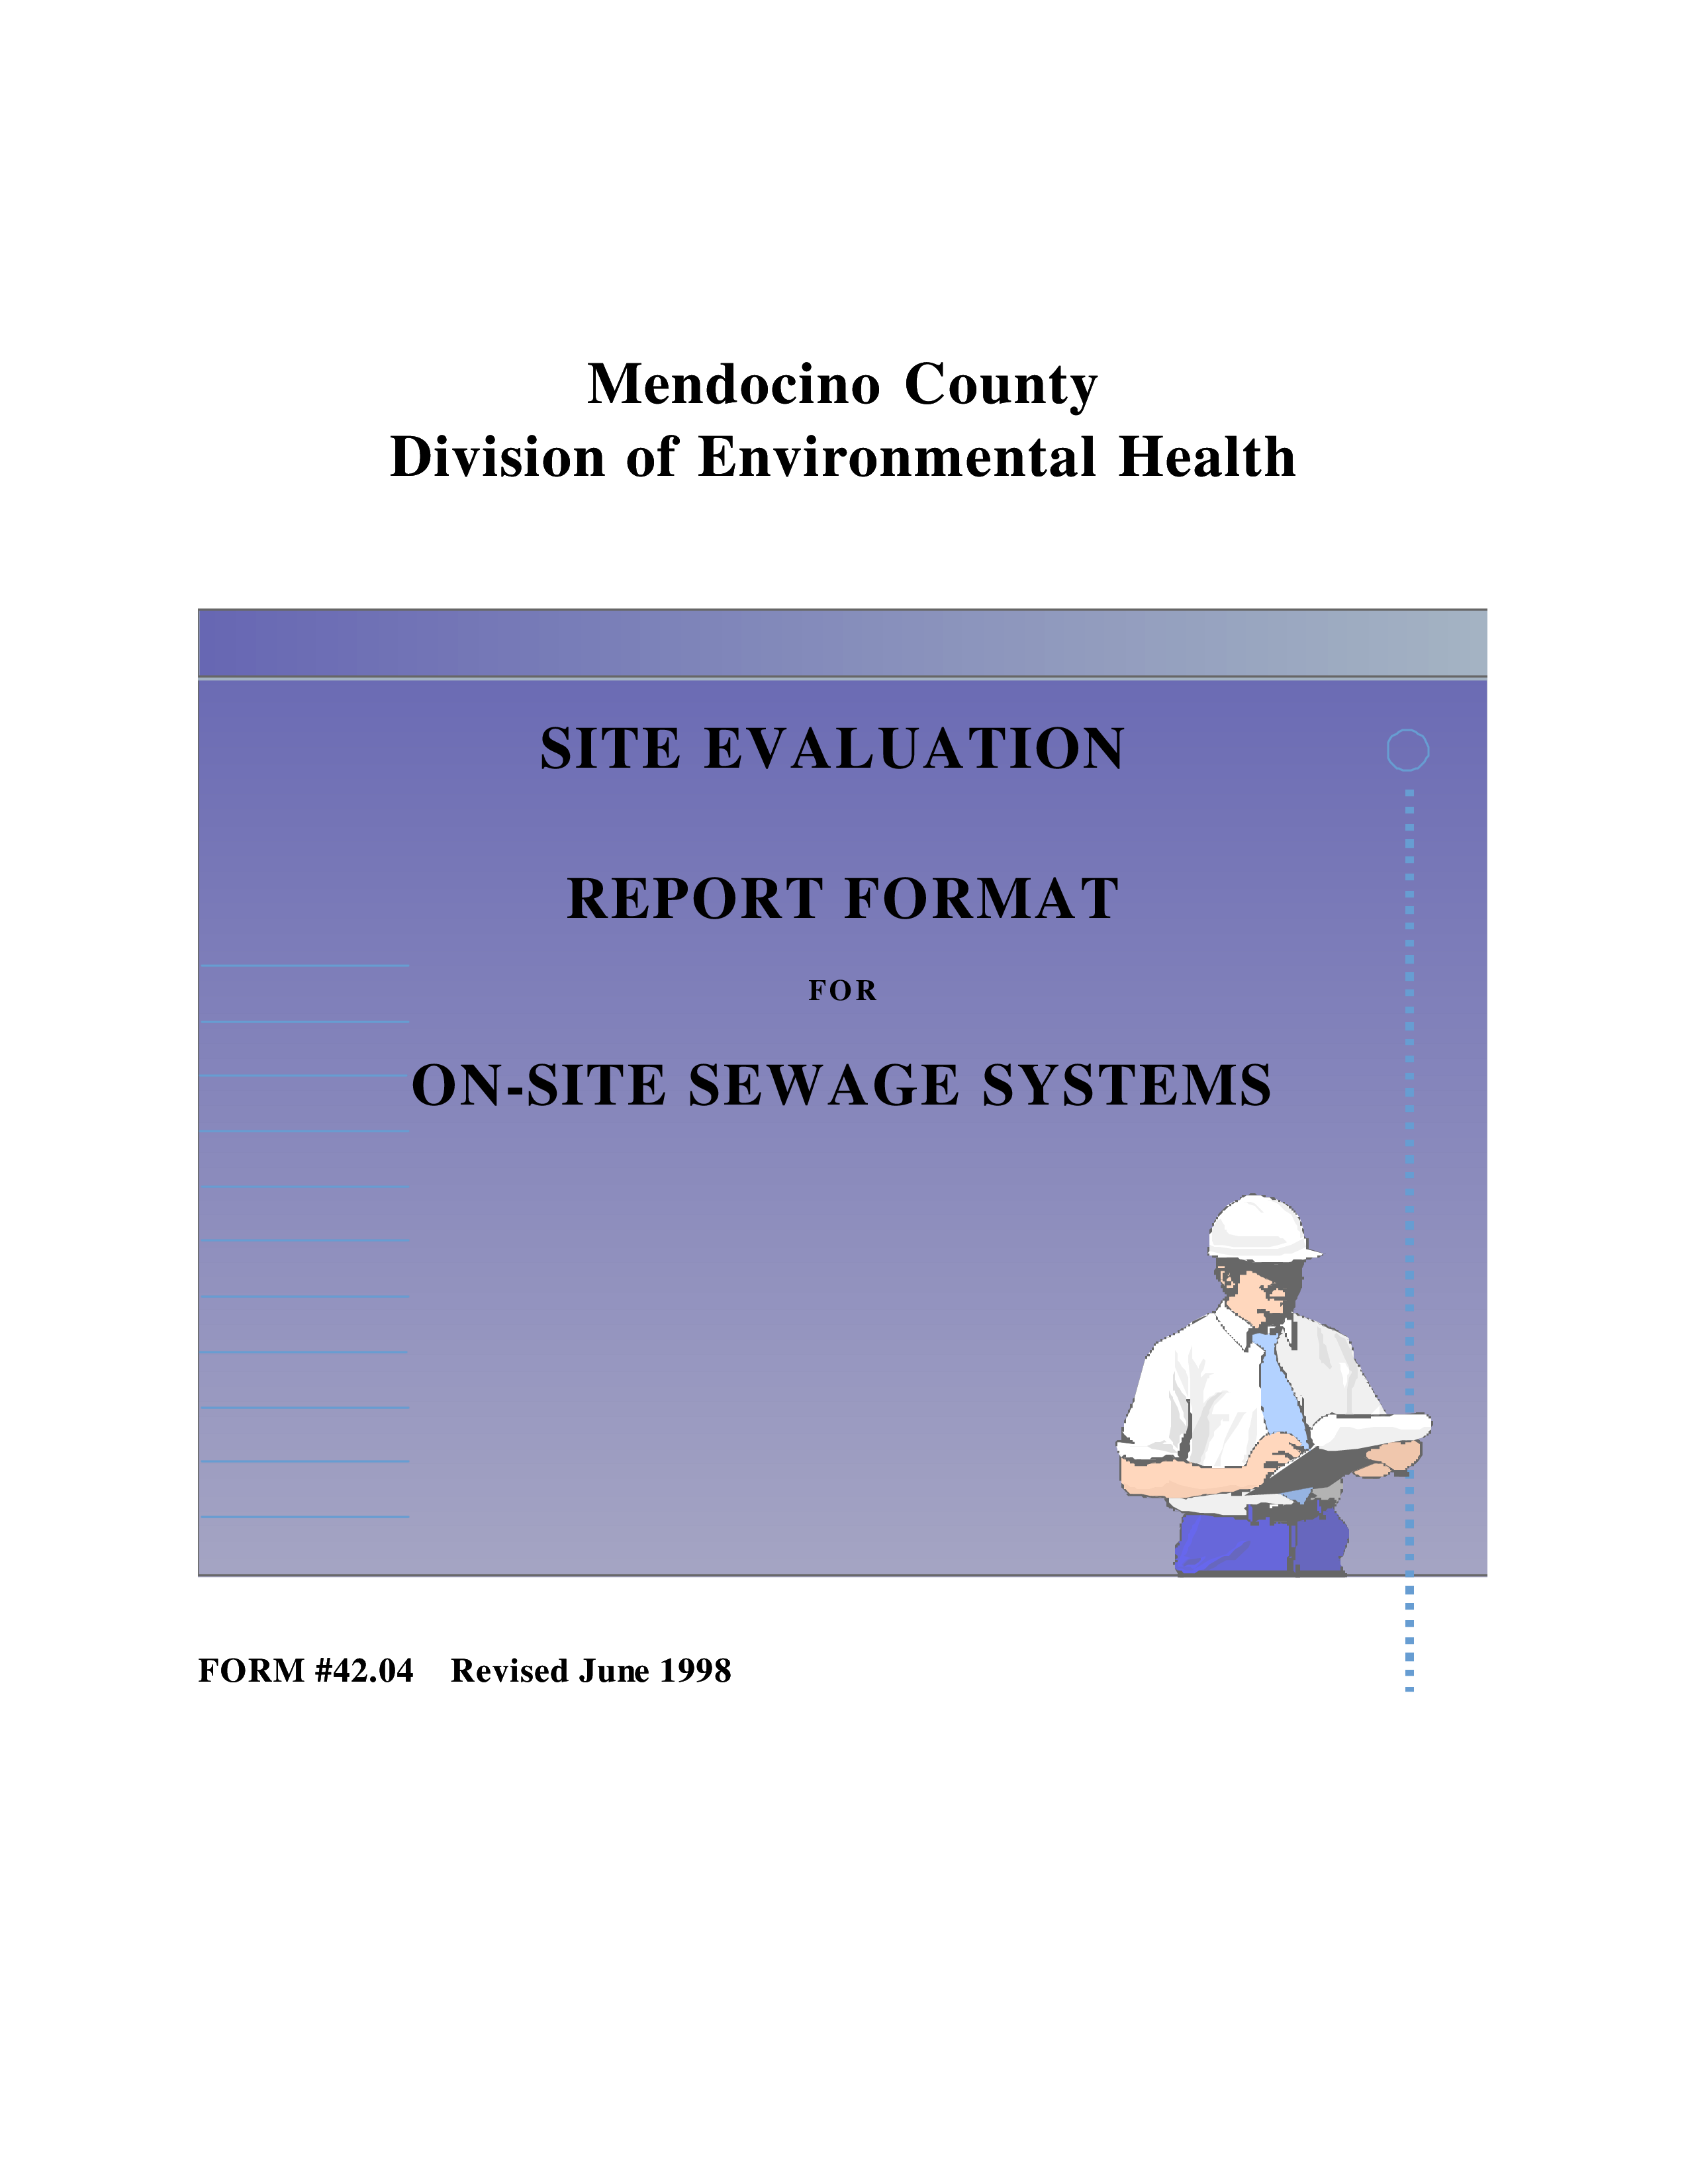 Free Evaluation Report Format Templates At Allbusinesstemplates